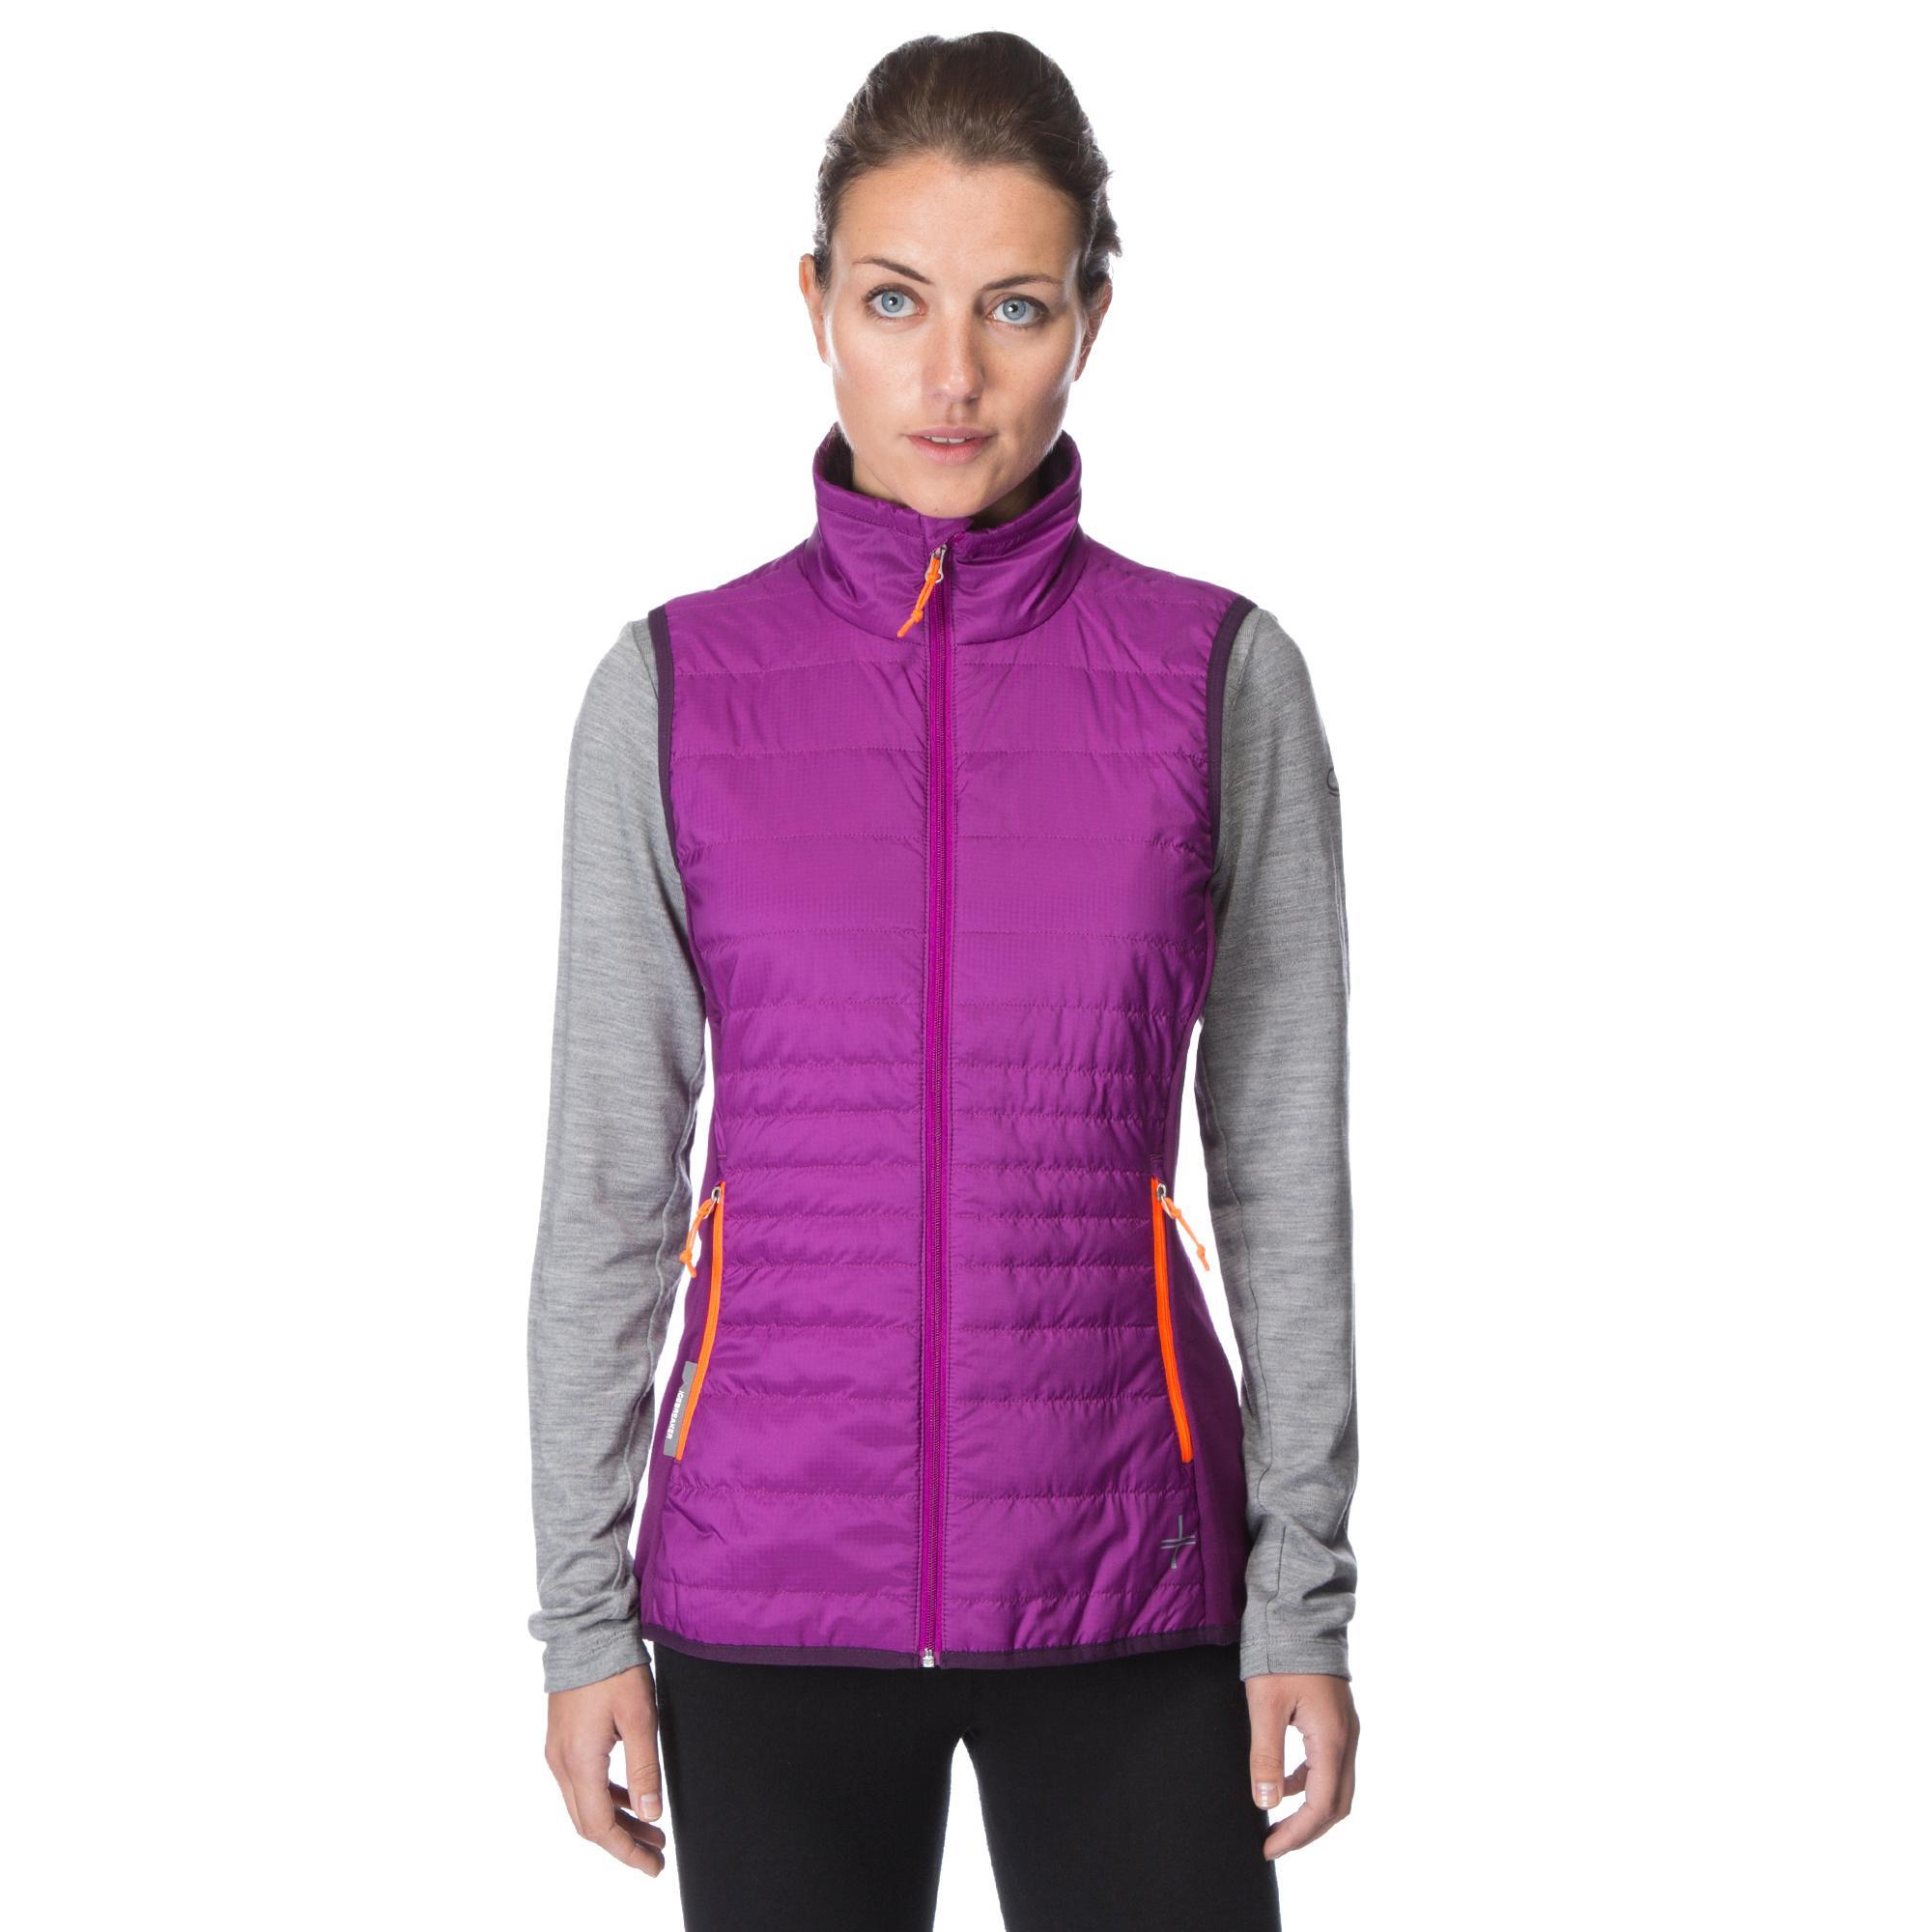 Icebreaker Womens Halo Vest Purple